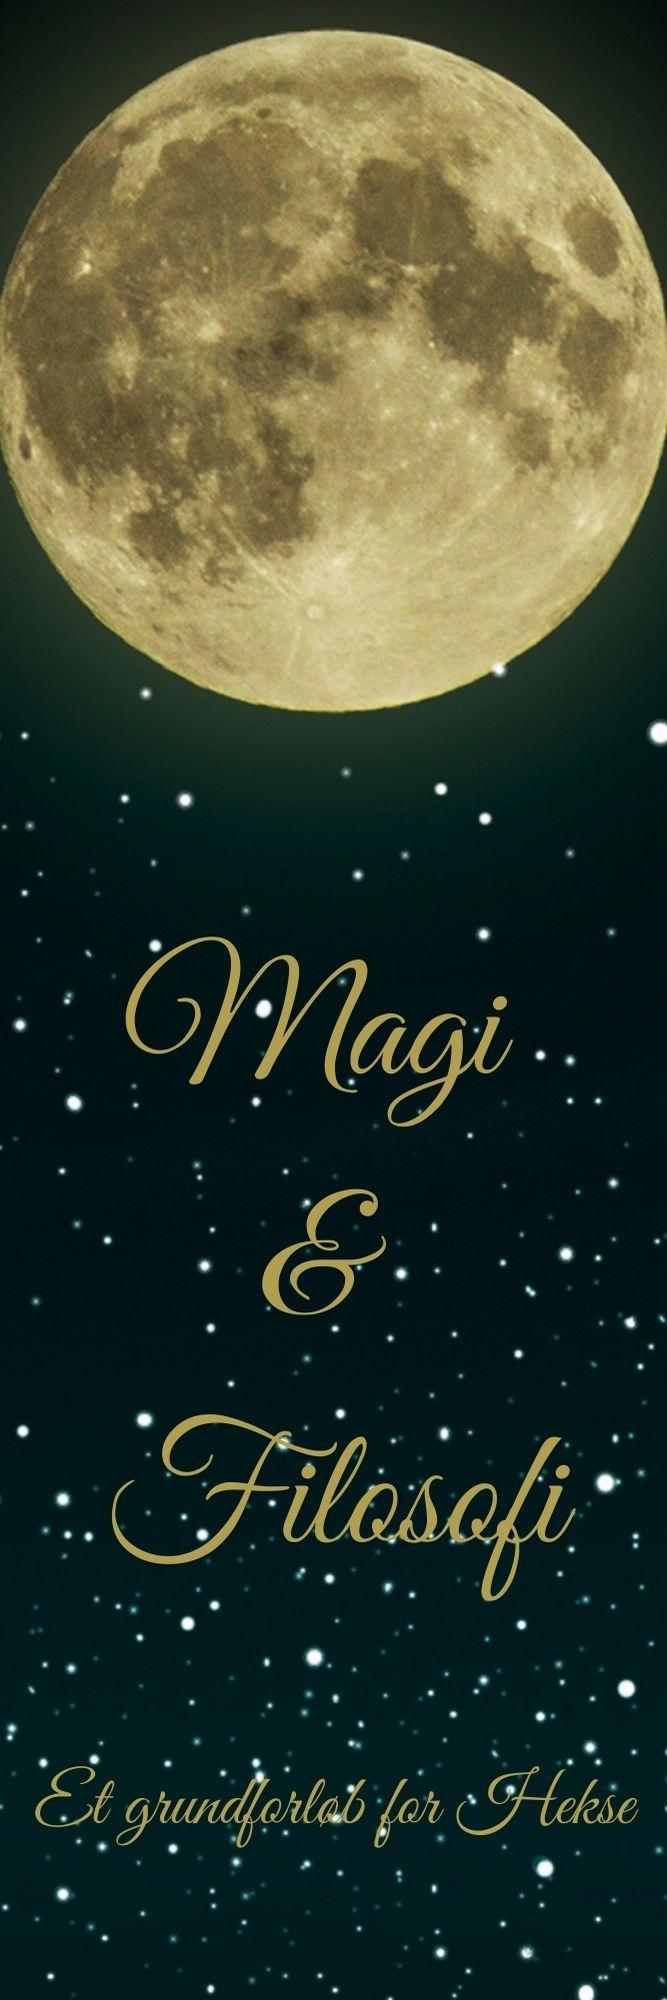 Uddannelse i Magi & Filosofi